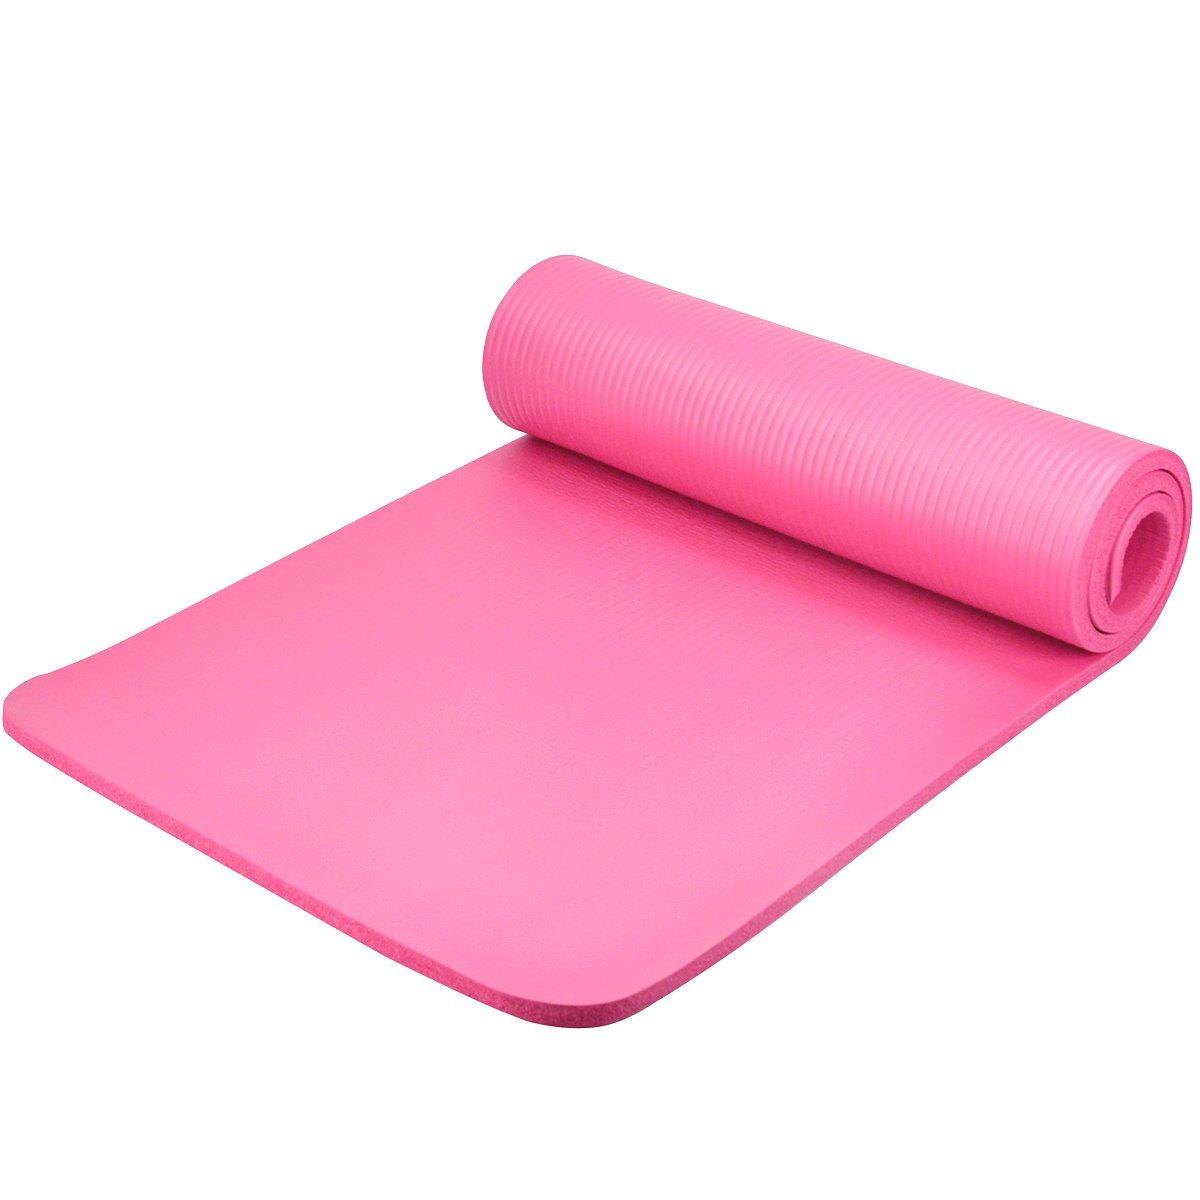 foam exercise yoga mat boxing fitness gym training pilates anti slip surface bt ebay. Black Bedroom Furniture Sets. Home Design Ideas